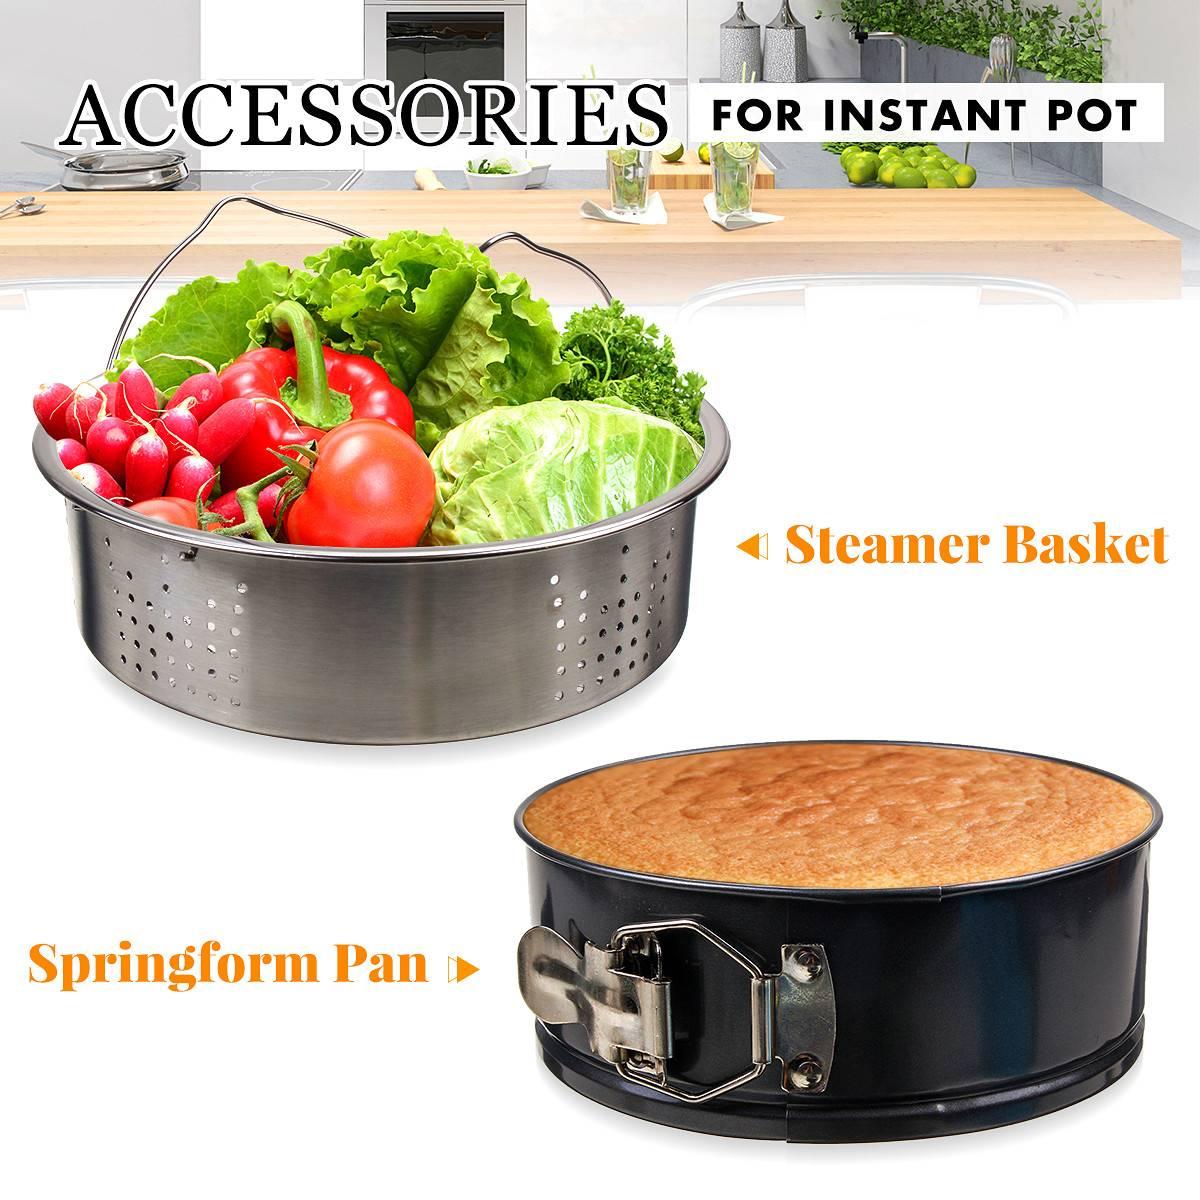 2 Pcs Instant Pot Accessories Stainless Steel Steamer Basket, Springform Pan Rice Cooker Pressure Cooker Kitchen Accessories Set